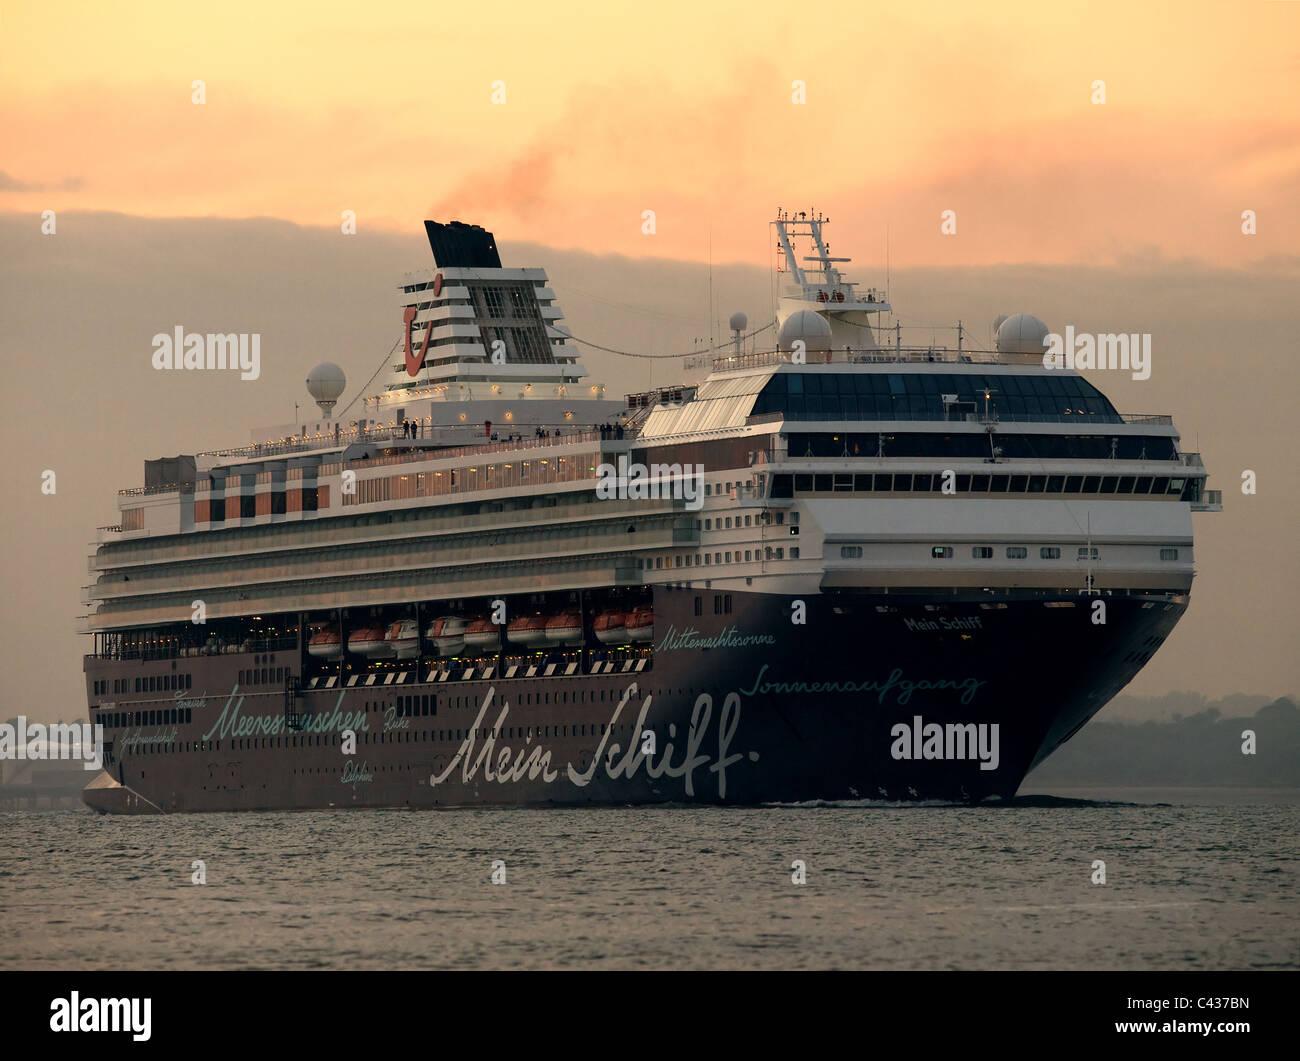 Cruise ship Mein Schiff leaving Southampton UK late evening - Stock Image